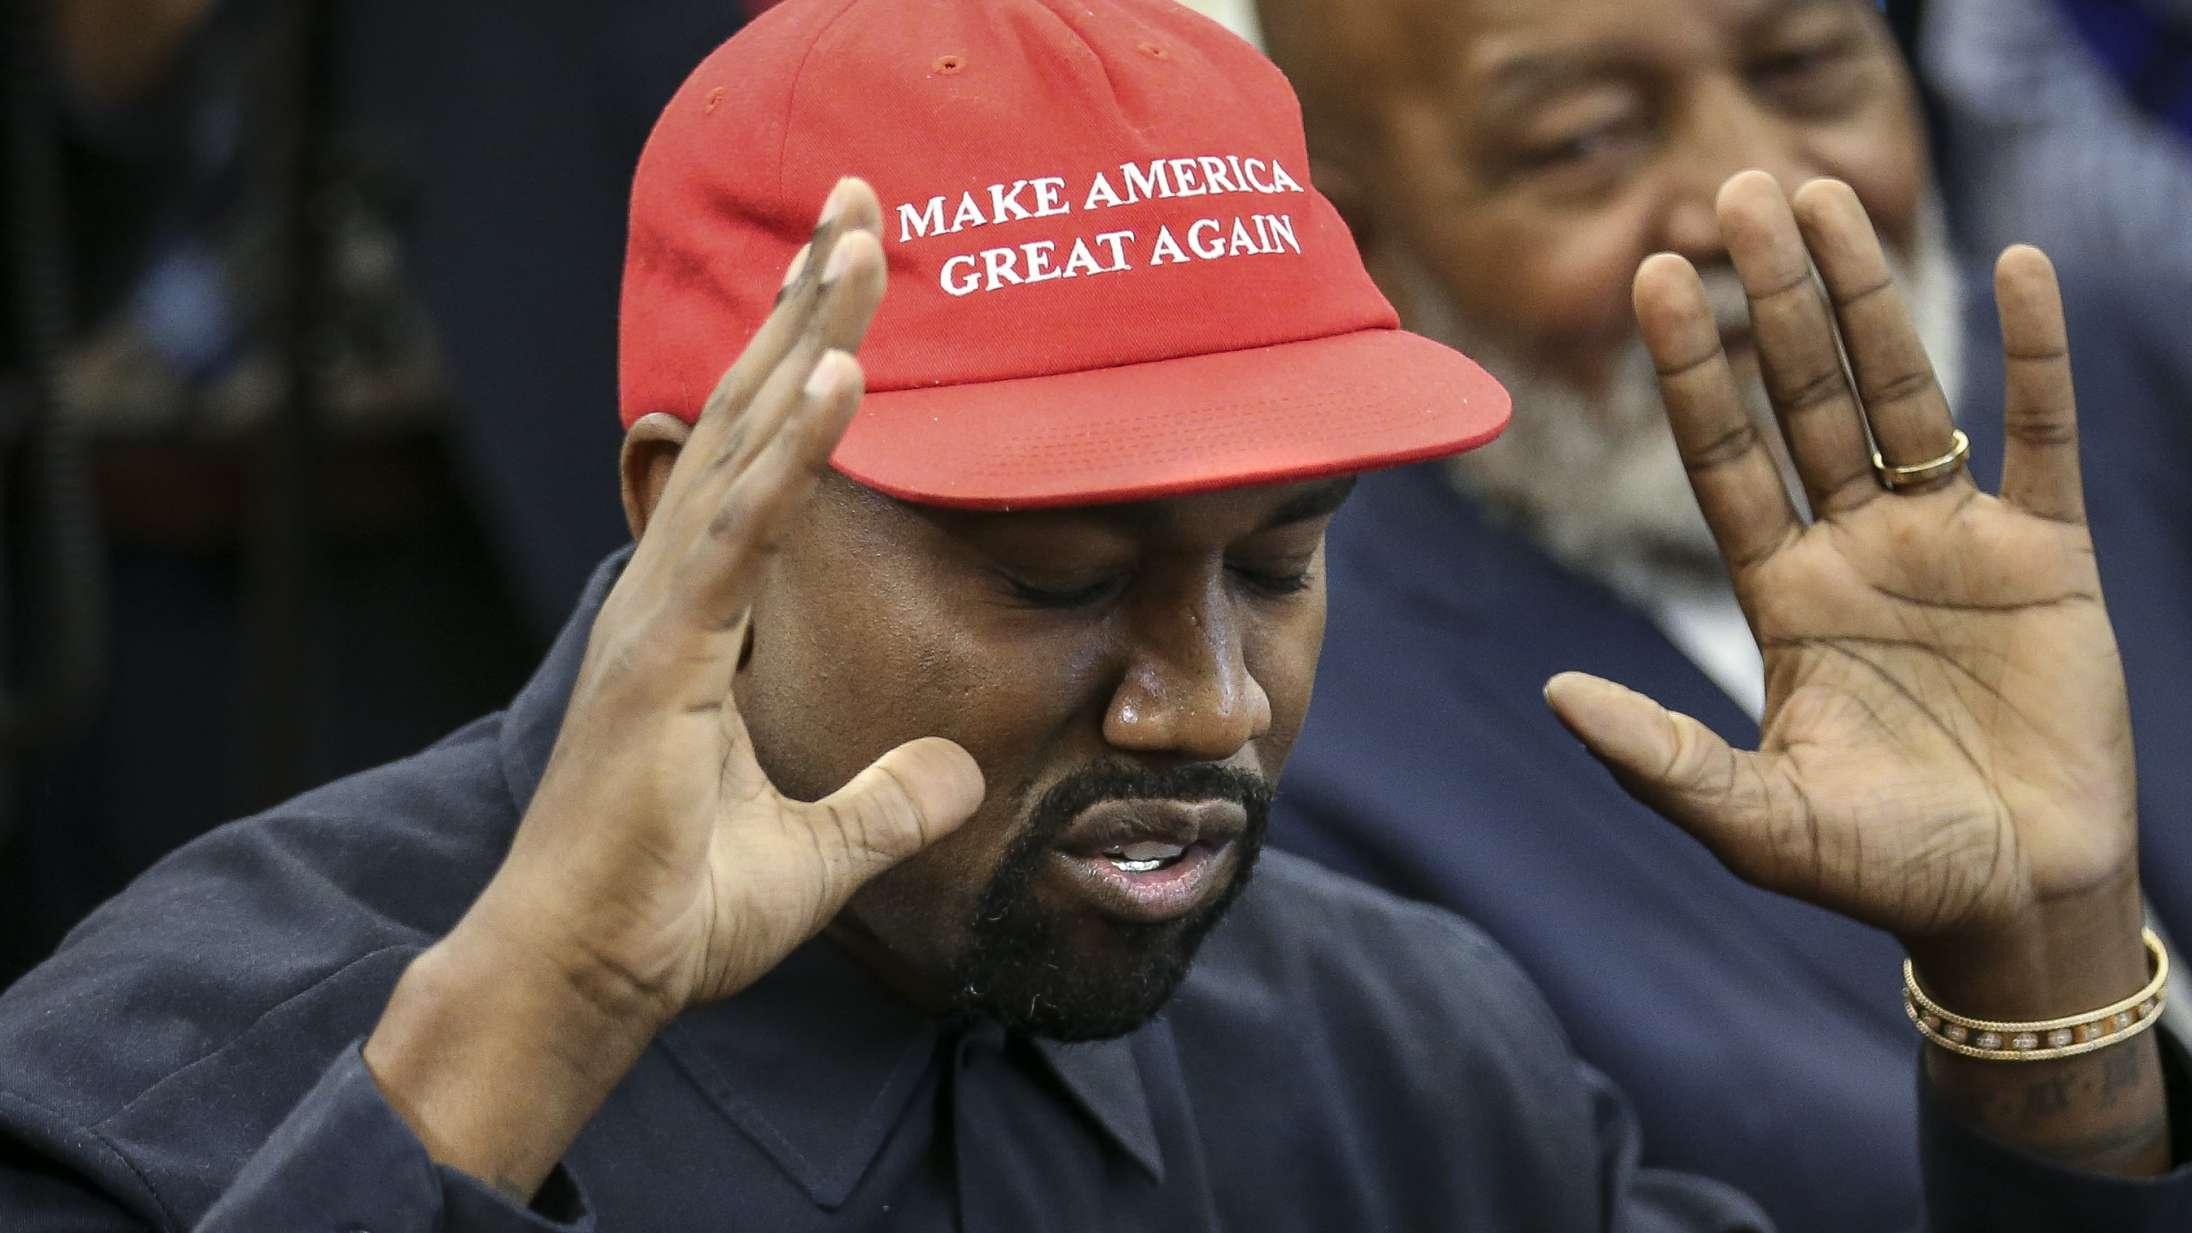 Issa Rae disser Kanye West i 'Saturday Night Live'-sketch – rapperen reagerer prompte